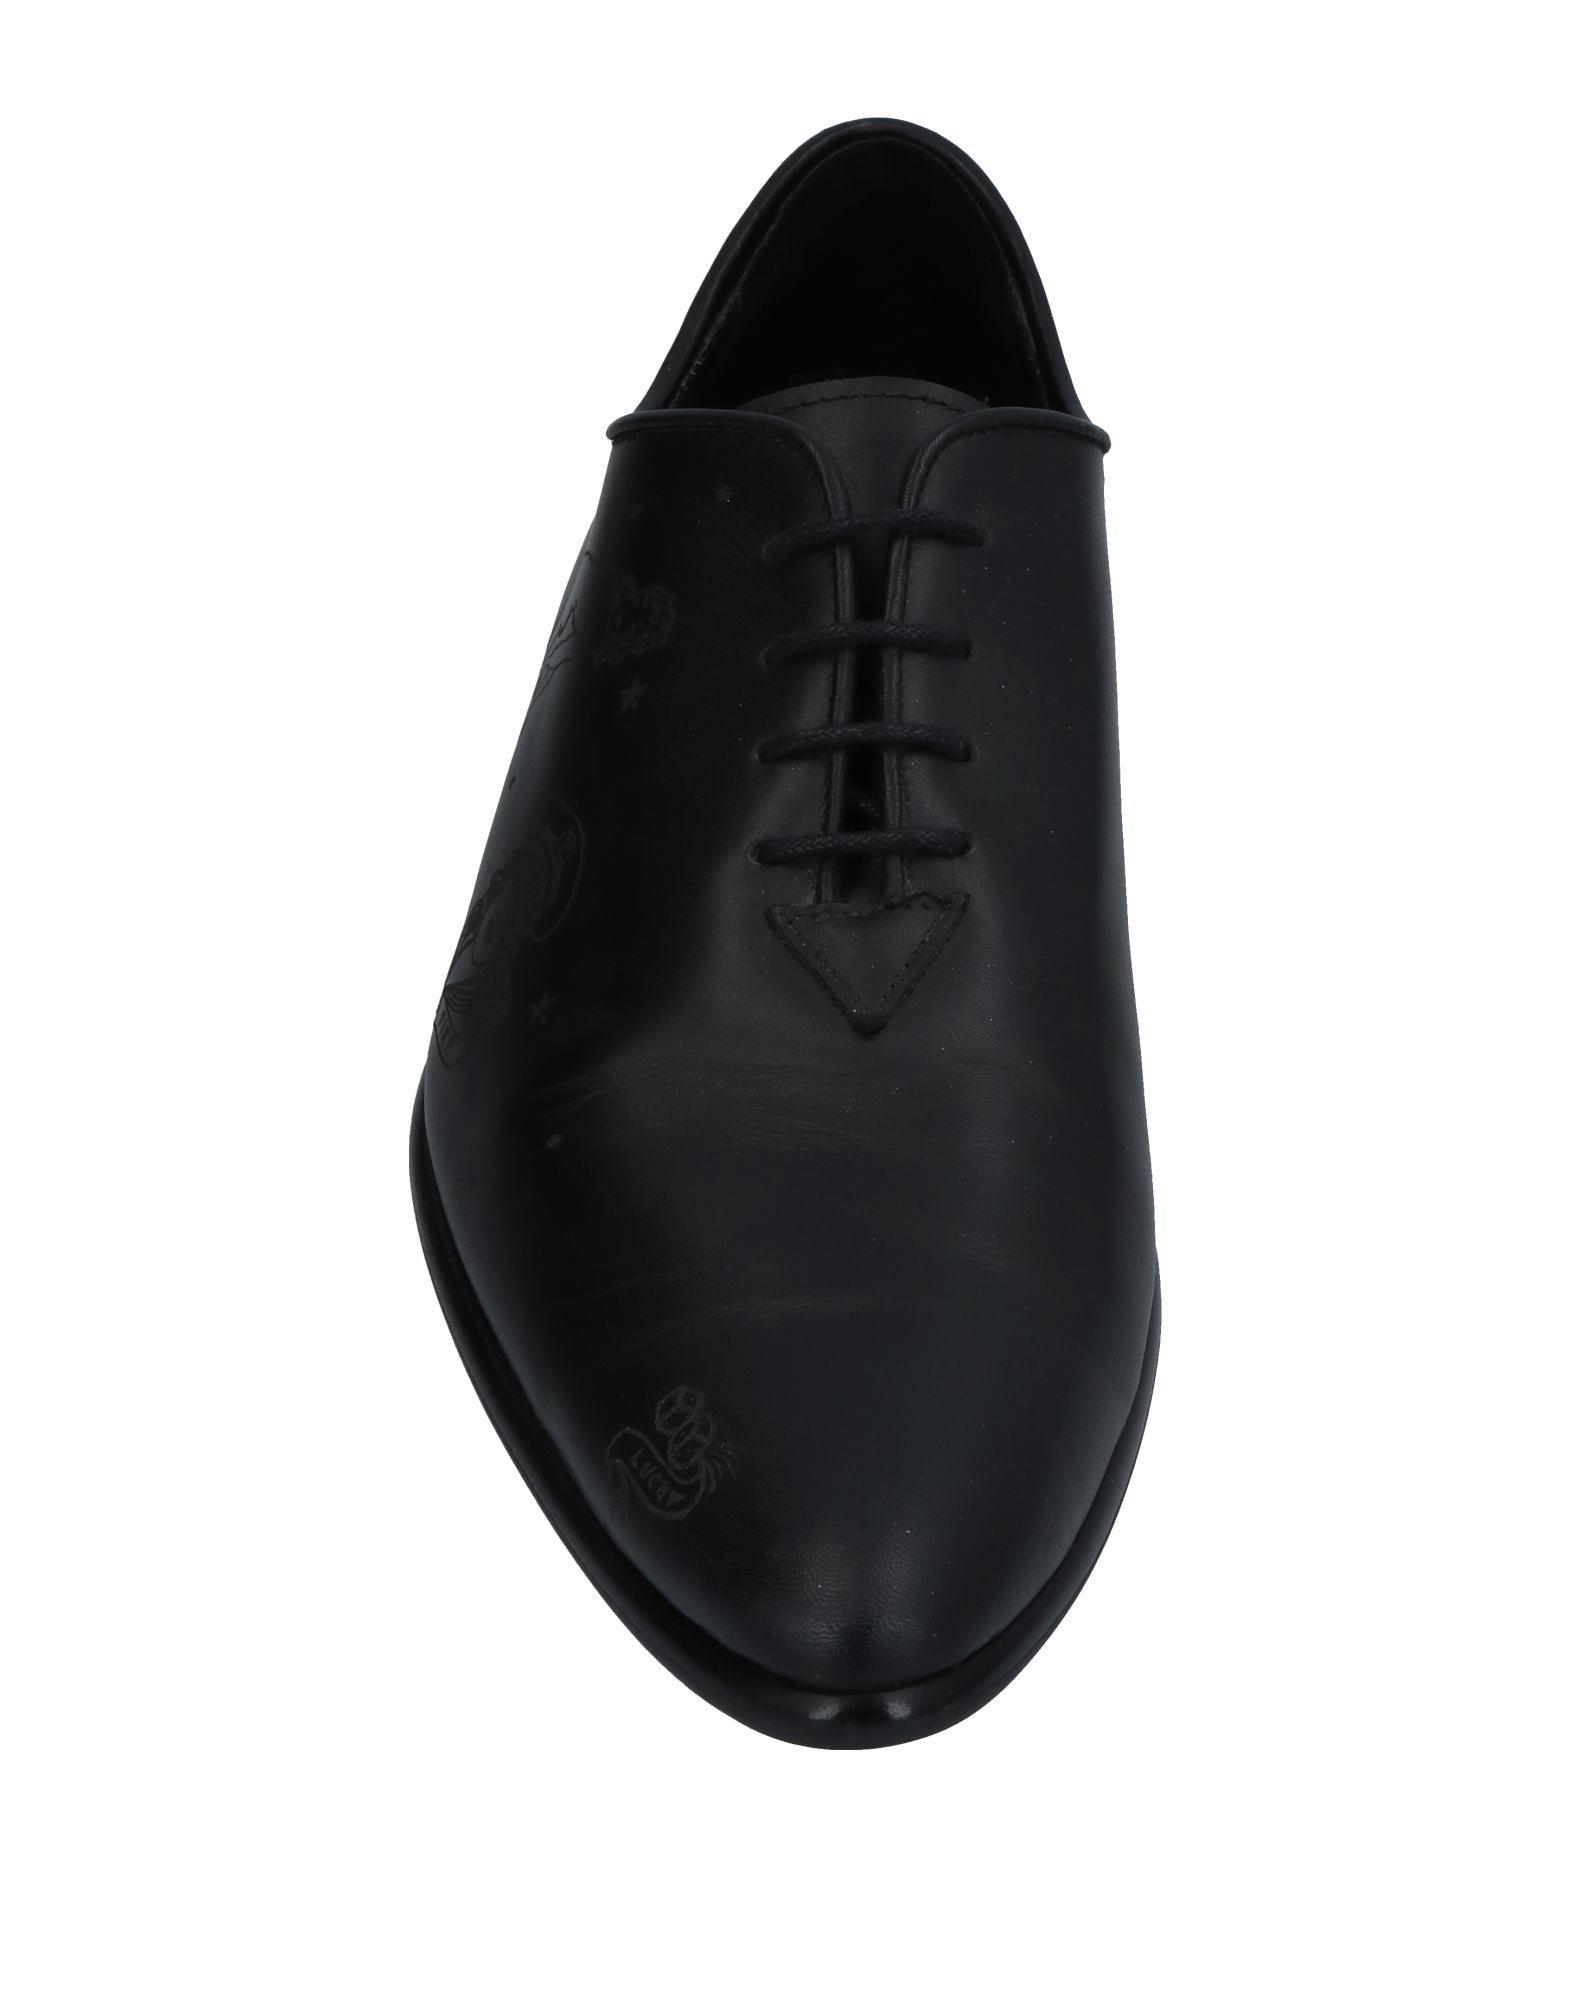 Chaussures À Lacets Bruno Bordese Homme - Chaussures À Lacets Bruno Bordese sur